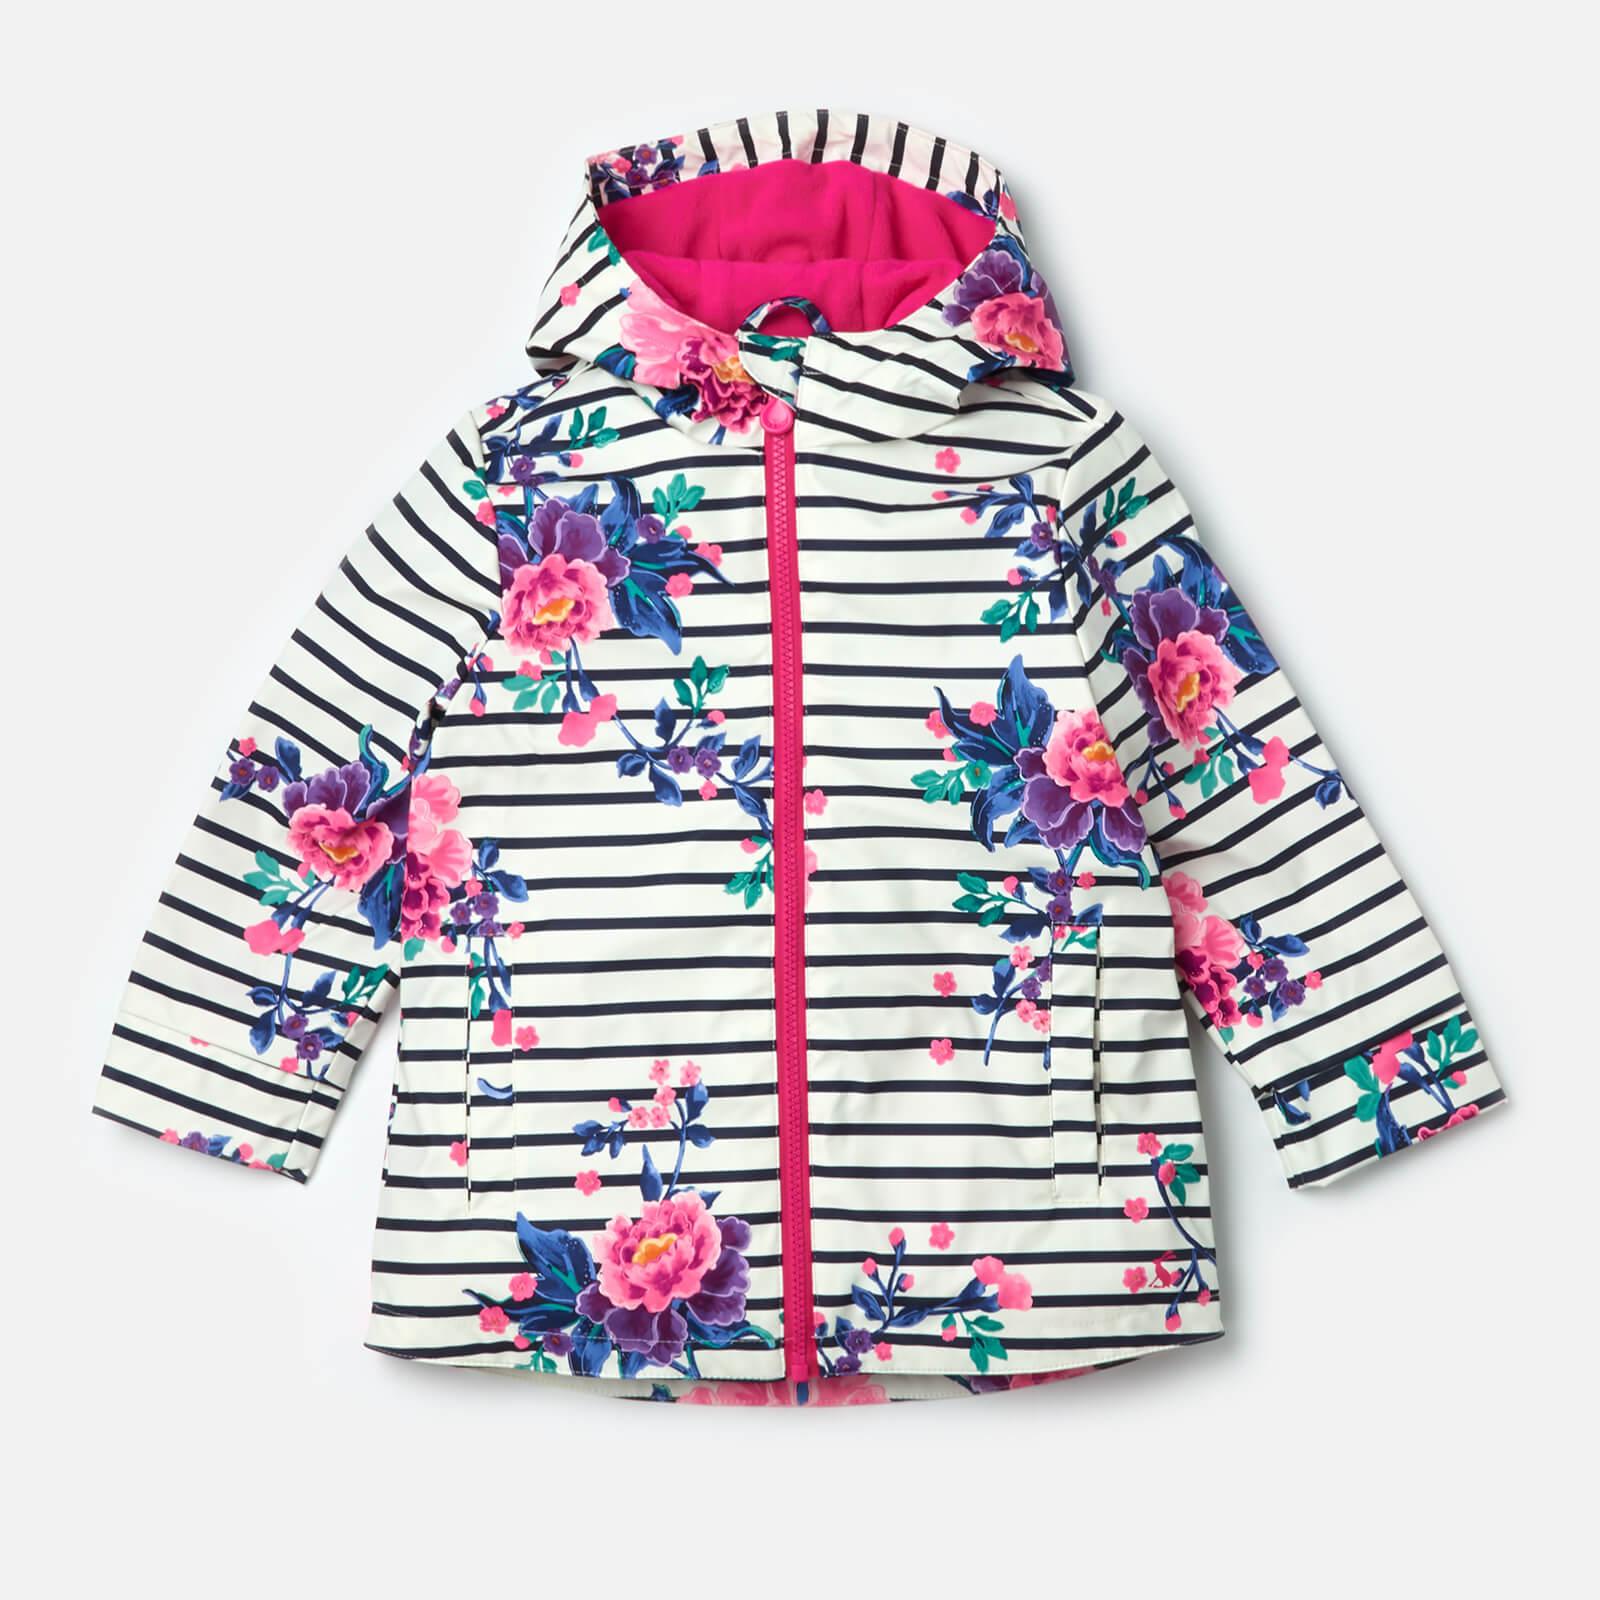 480e56cf7 Joules Girls' Raindance Waterproof Coat - Chinoise Stripe Clothing |  TheHut.com